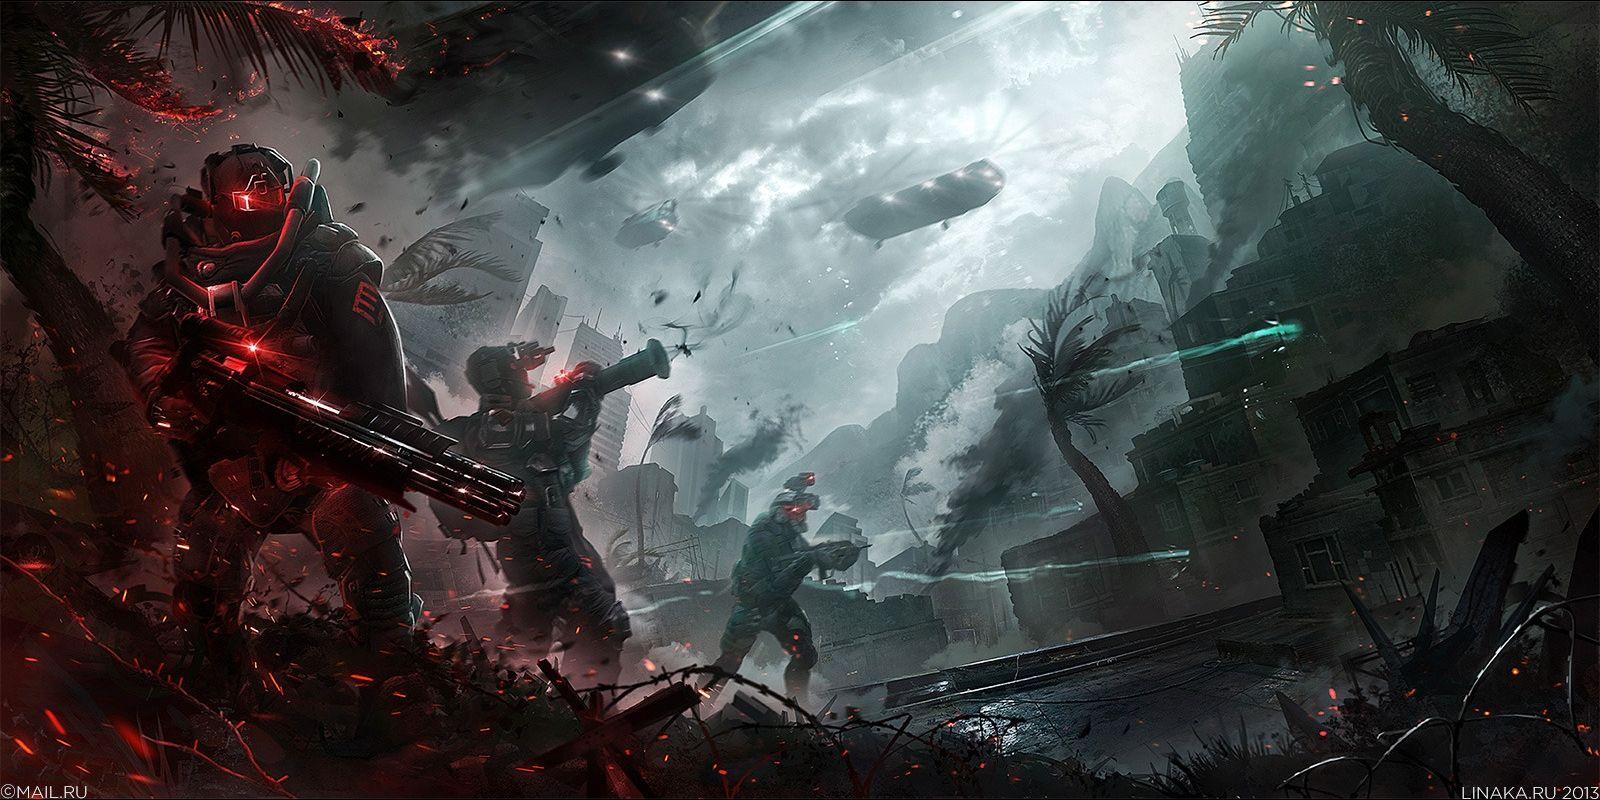 Sci Fi Battle Wallpaper Epic Art Battle Wallpaper Pictures